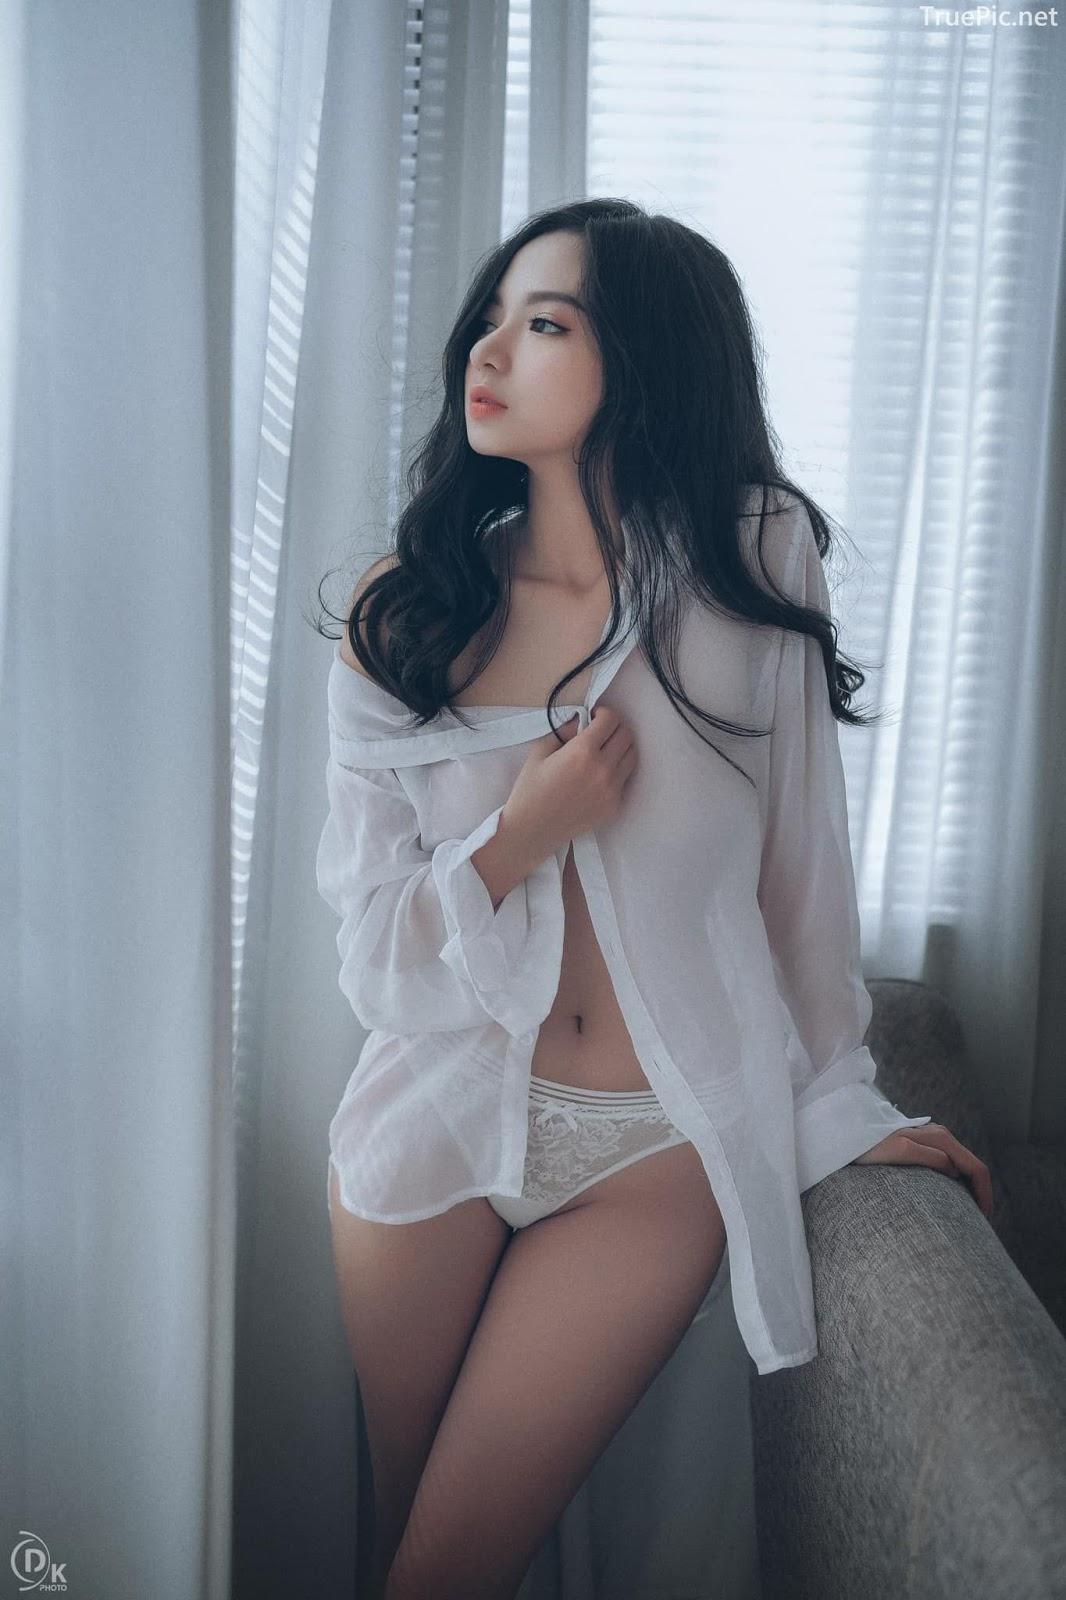 Vietnamese Sexy Model - Vu Ngoc Kim Chi - Beautiful in white - TruePic.net- Picture 18